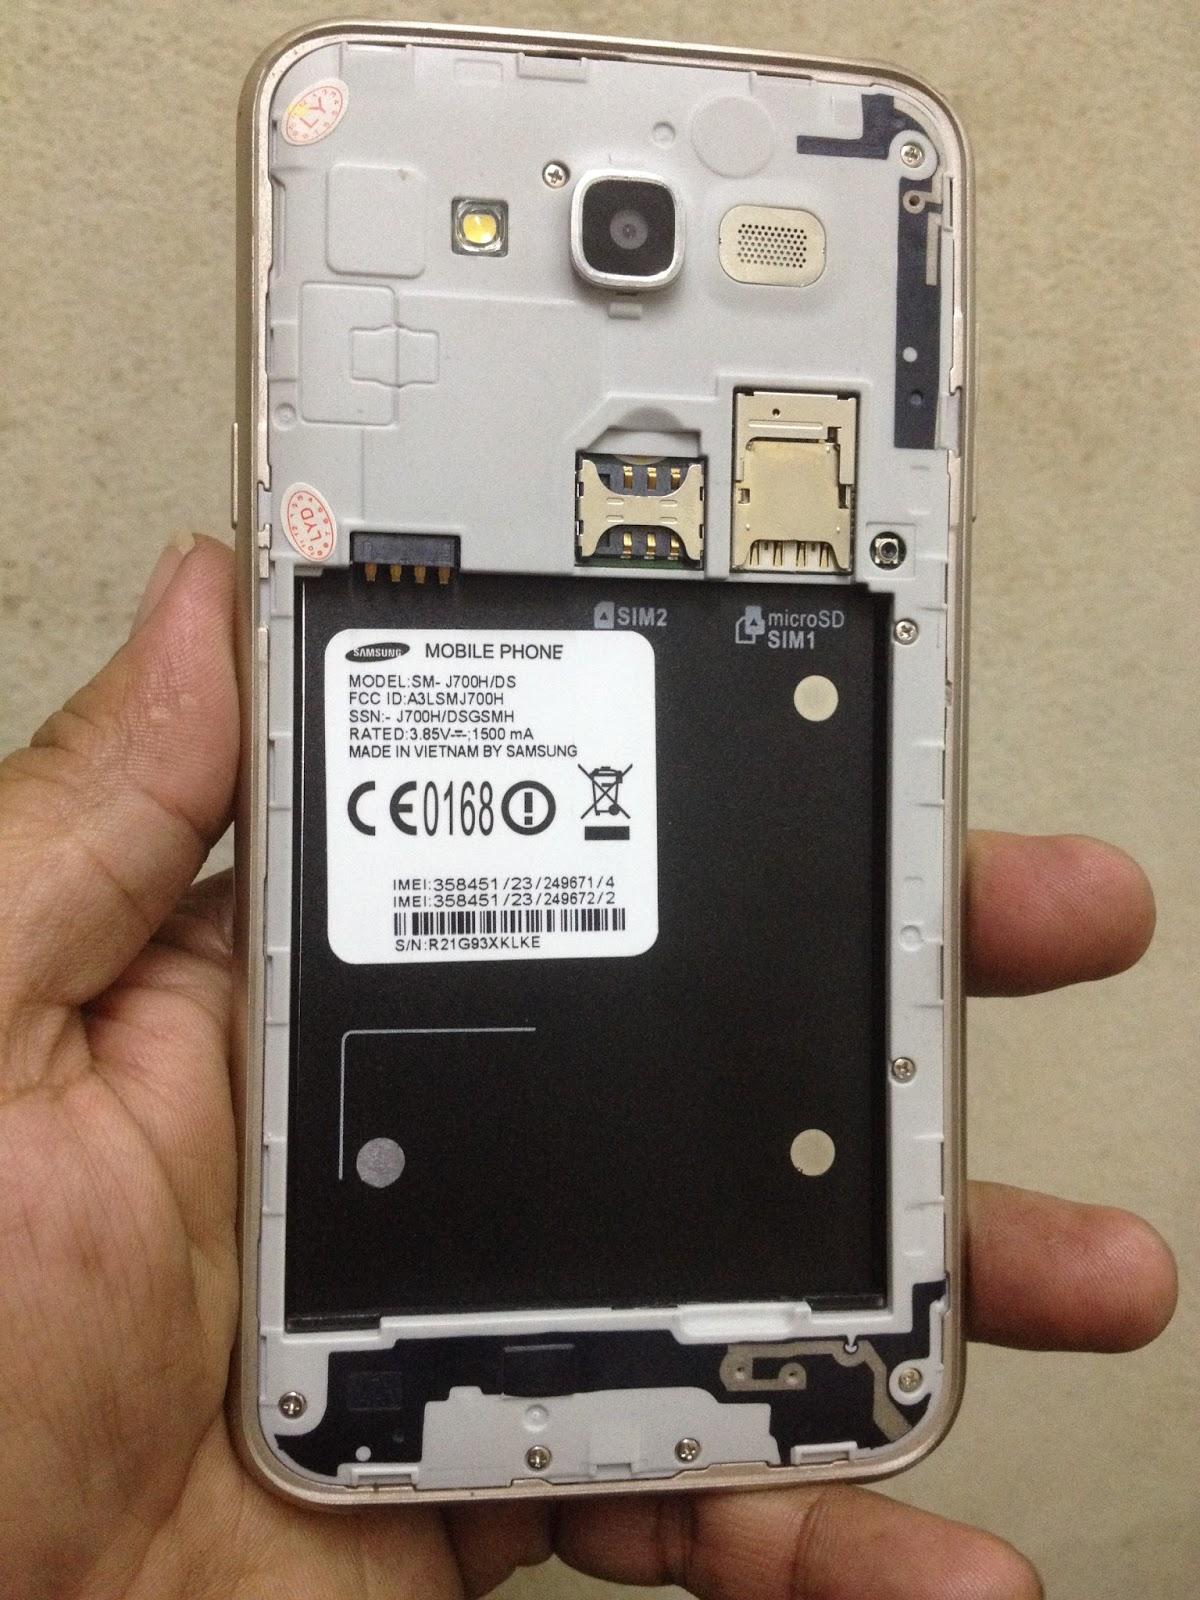 GSM Firmware BD: SM-J700H/DS MT6572 Clone Firmware